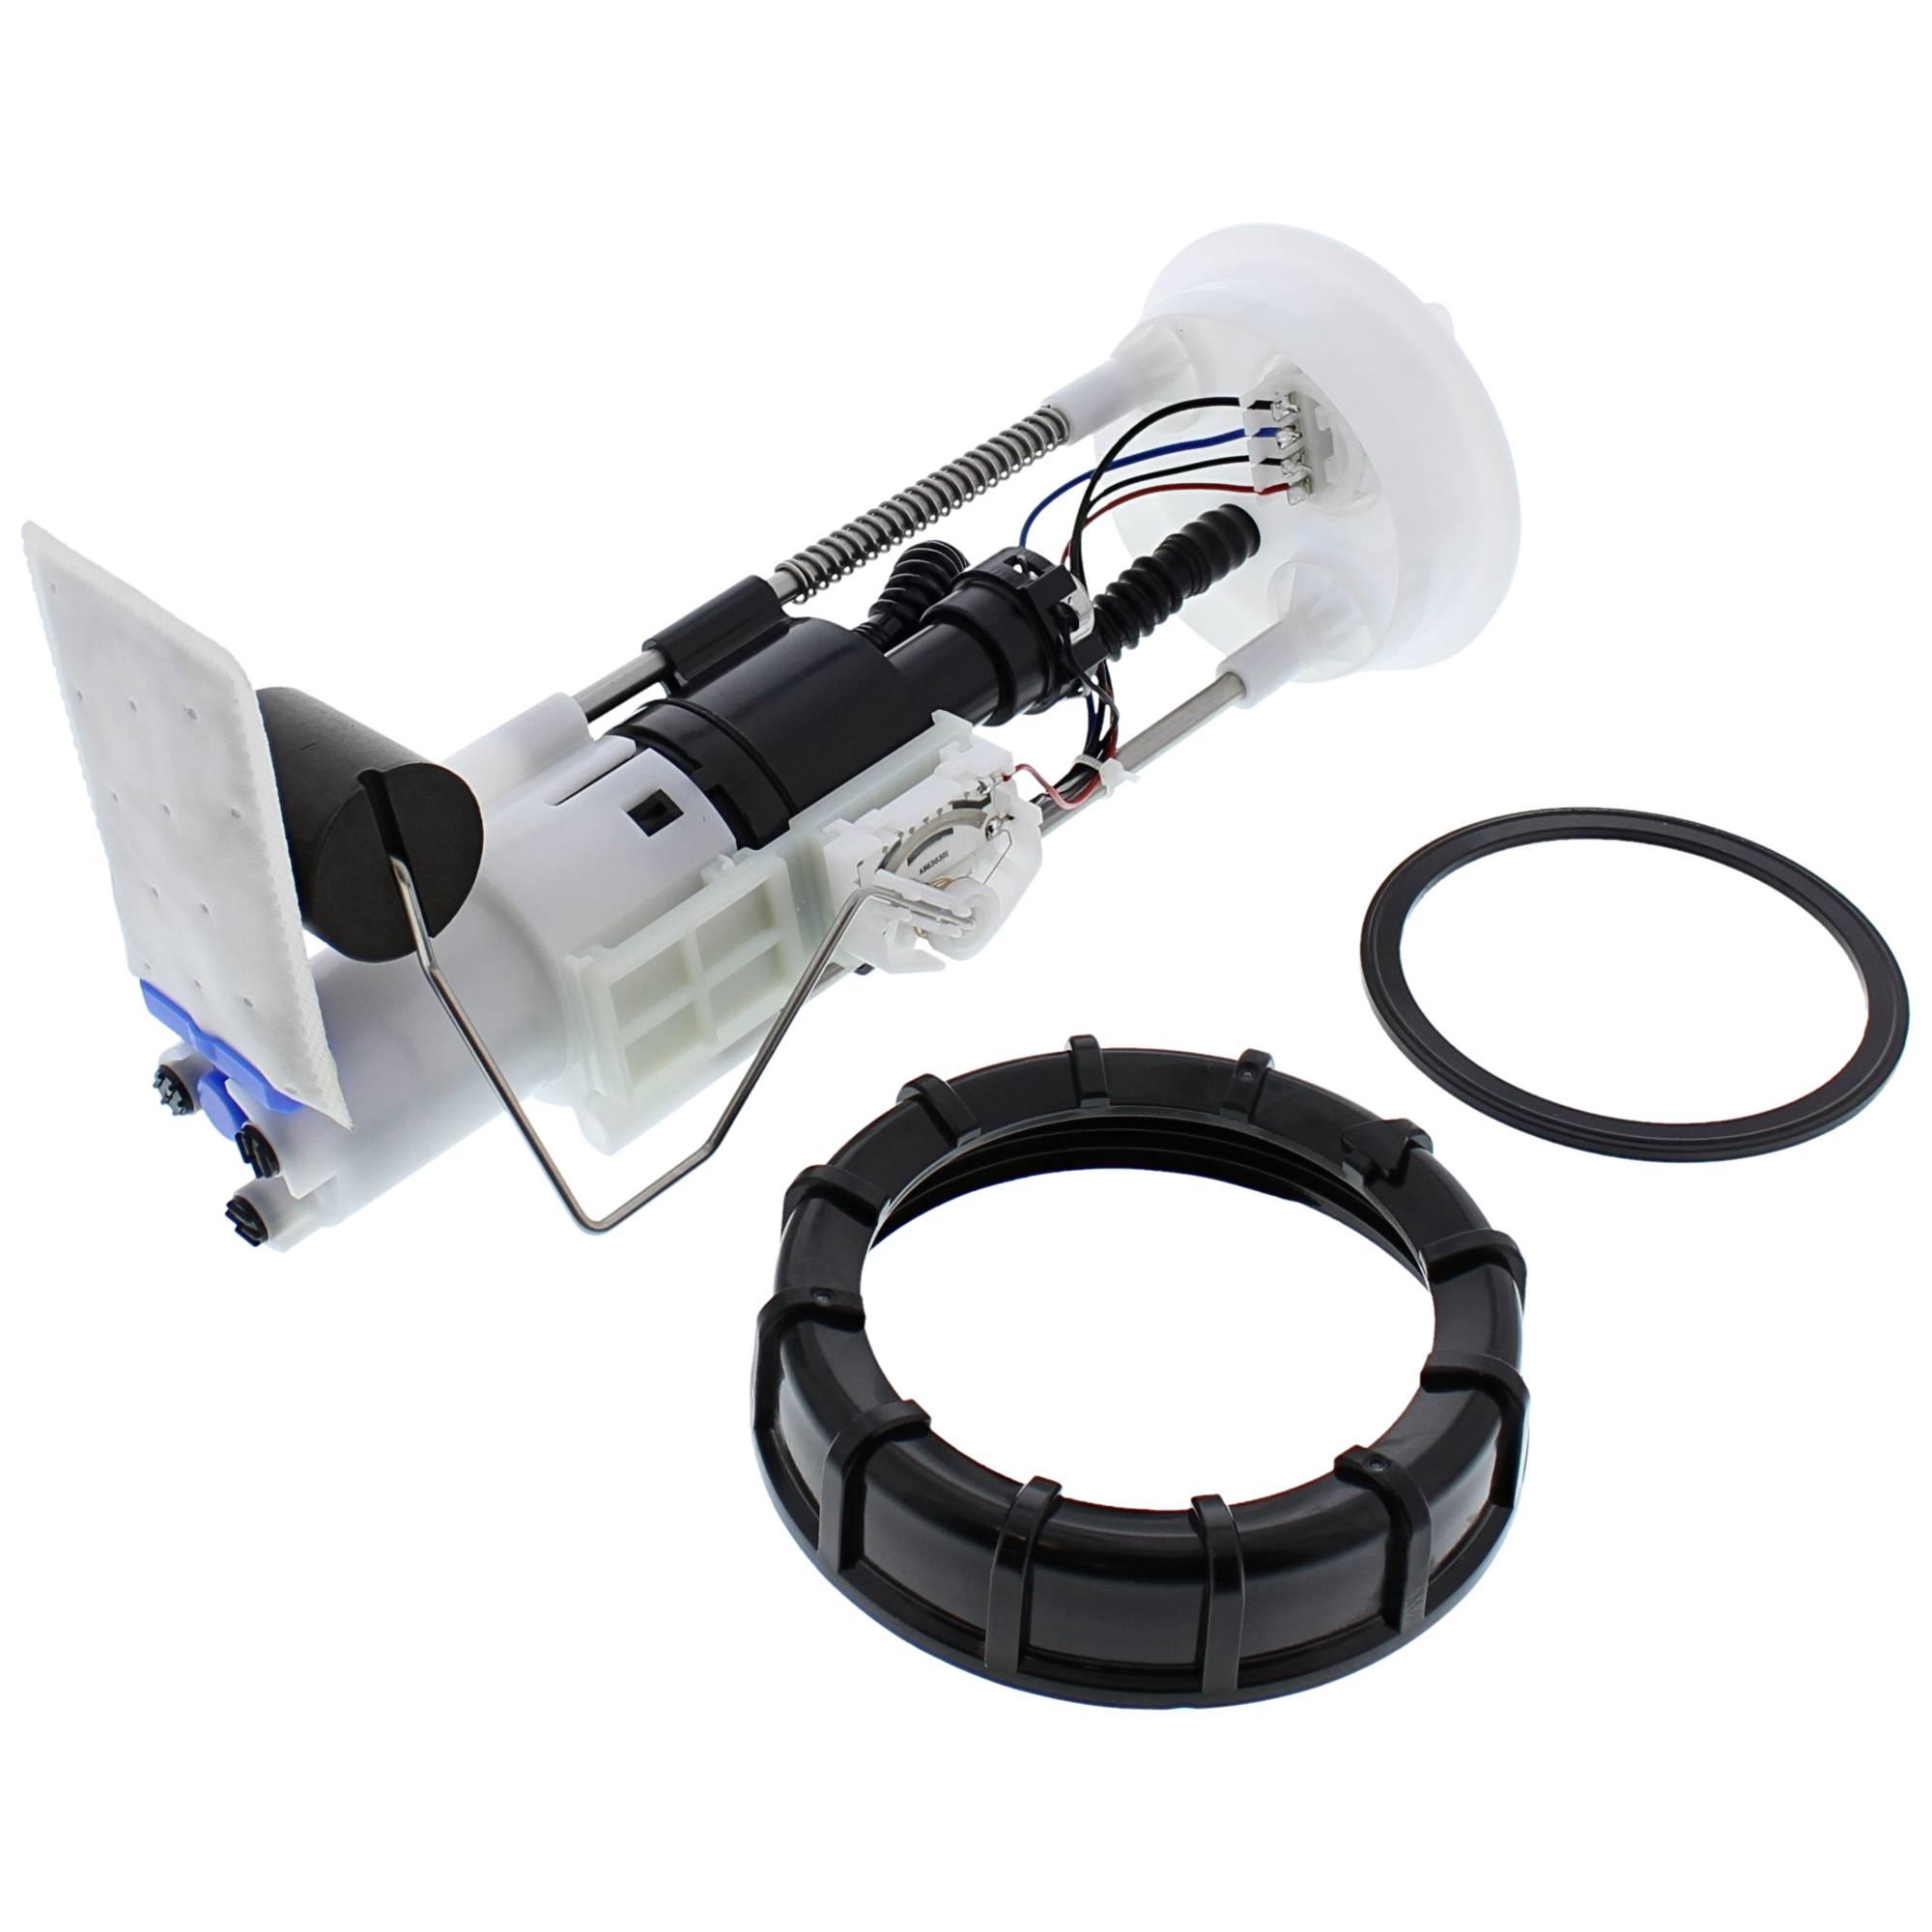 RZR S All Balls Fuel Pump Module for Polaris 4 800 47-1011